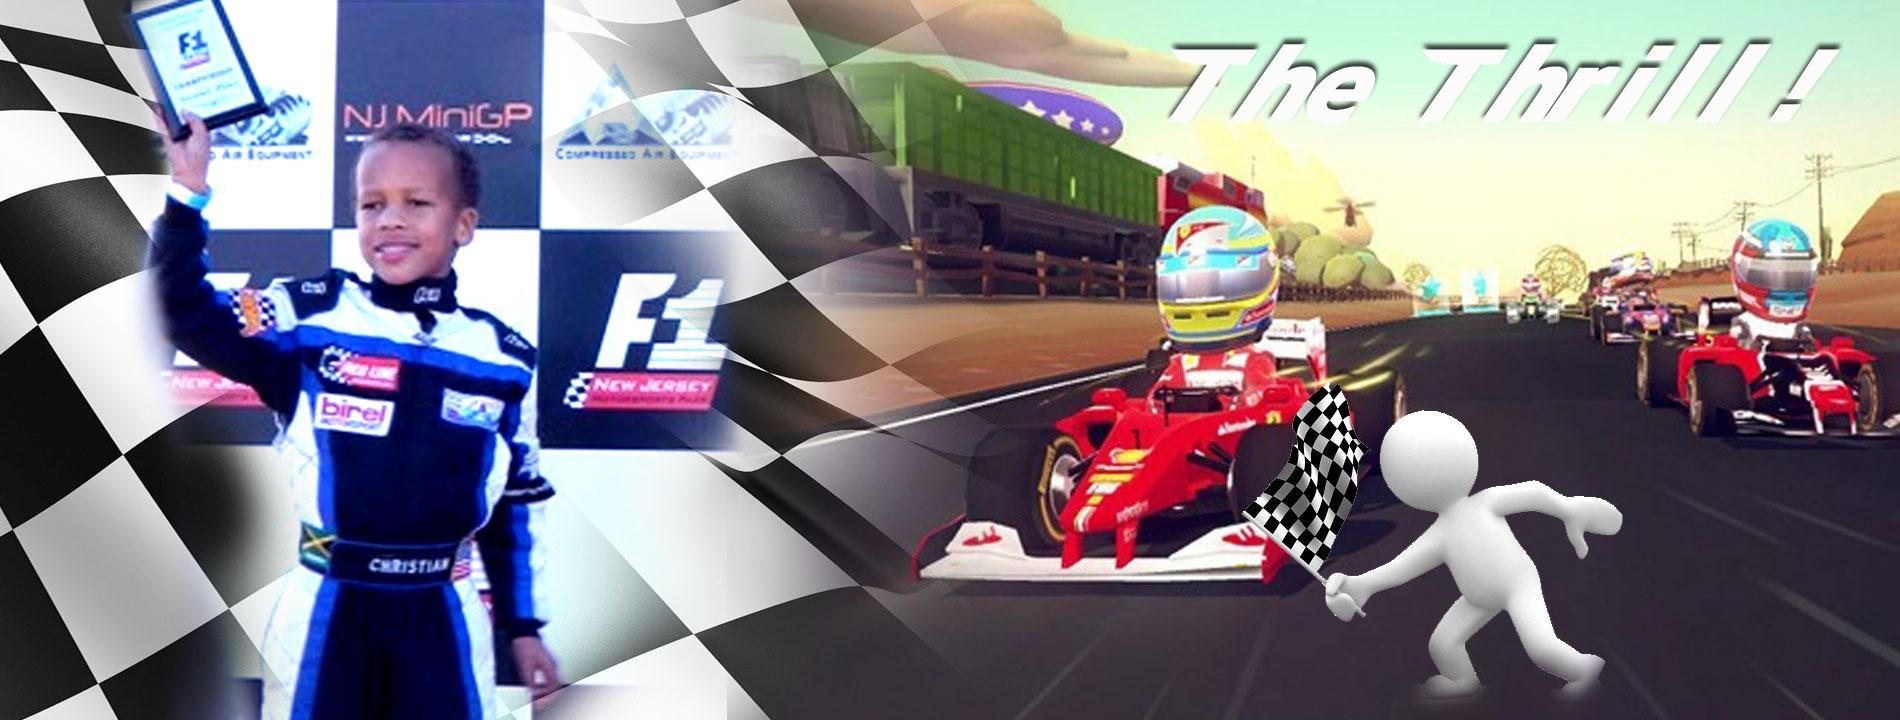 Christian's Racing Montage